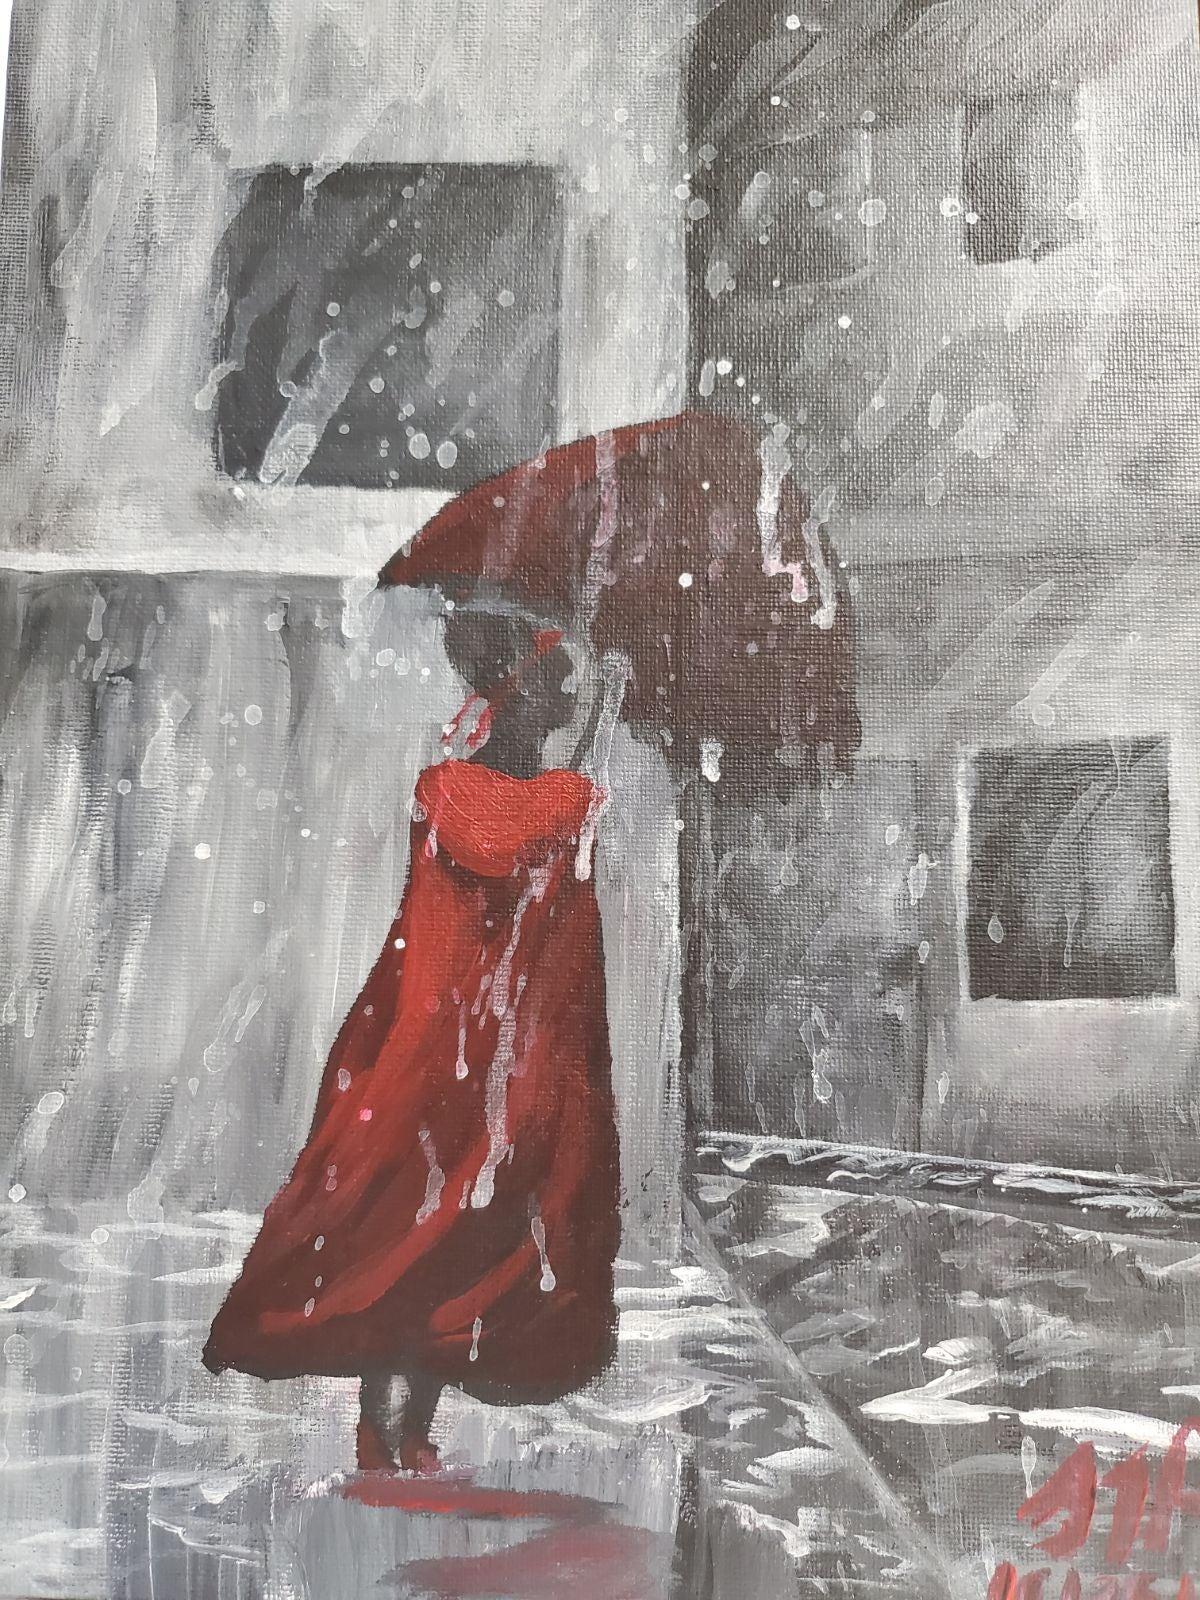 Monochromatic acrylic painting